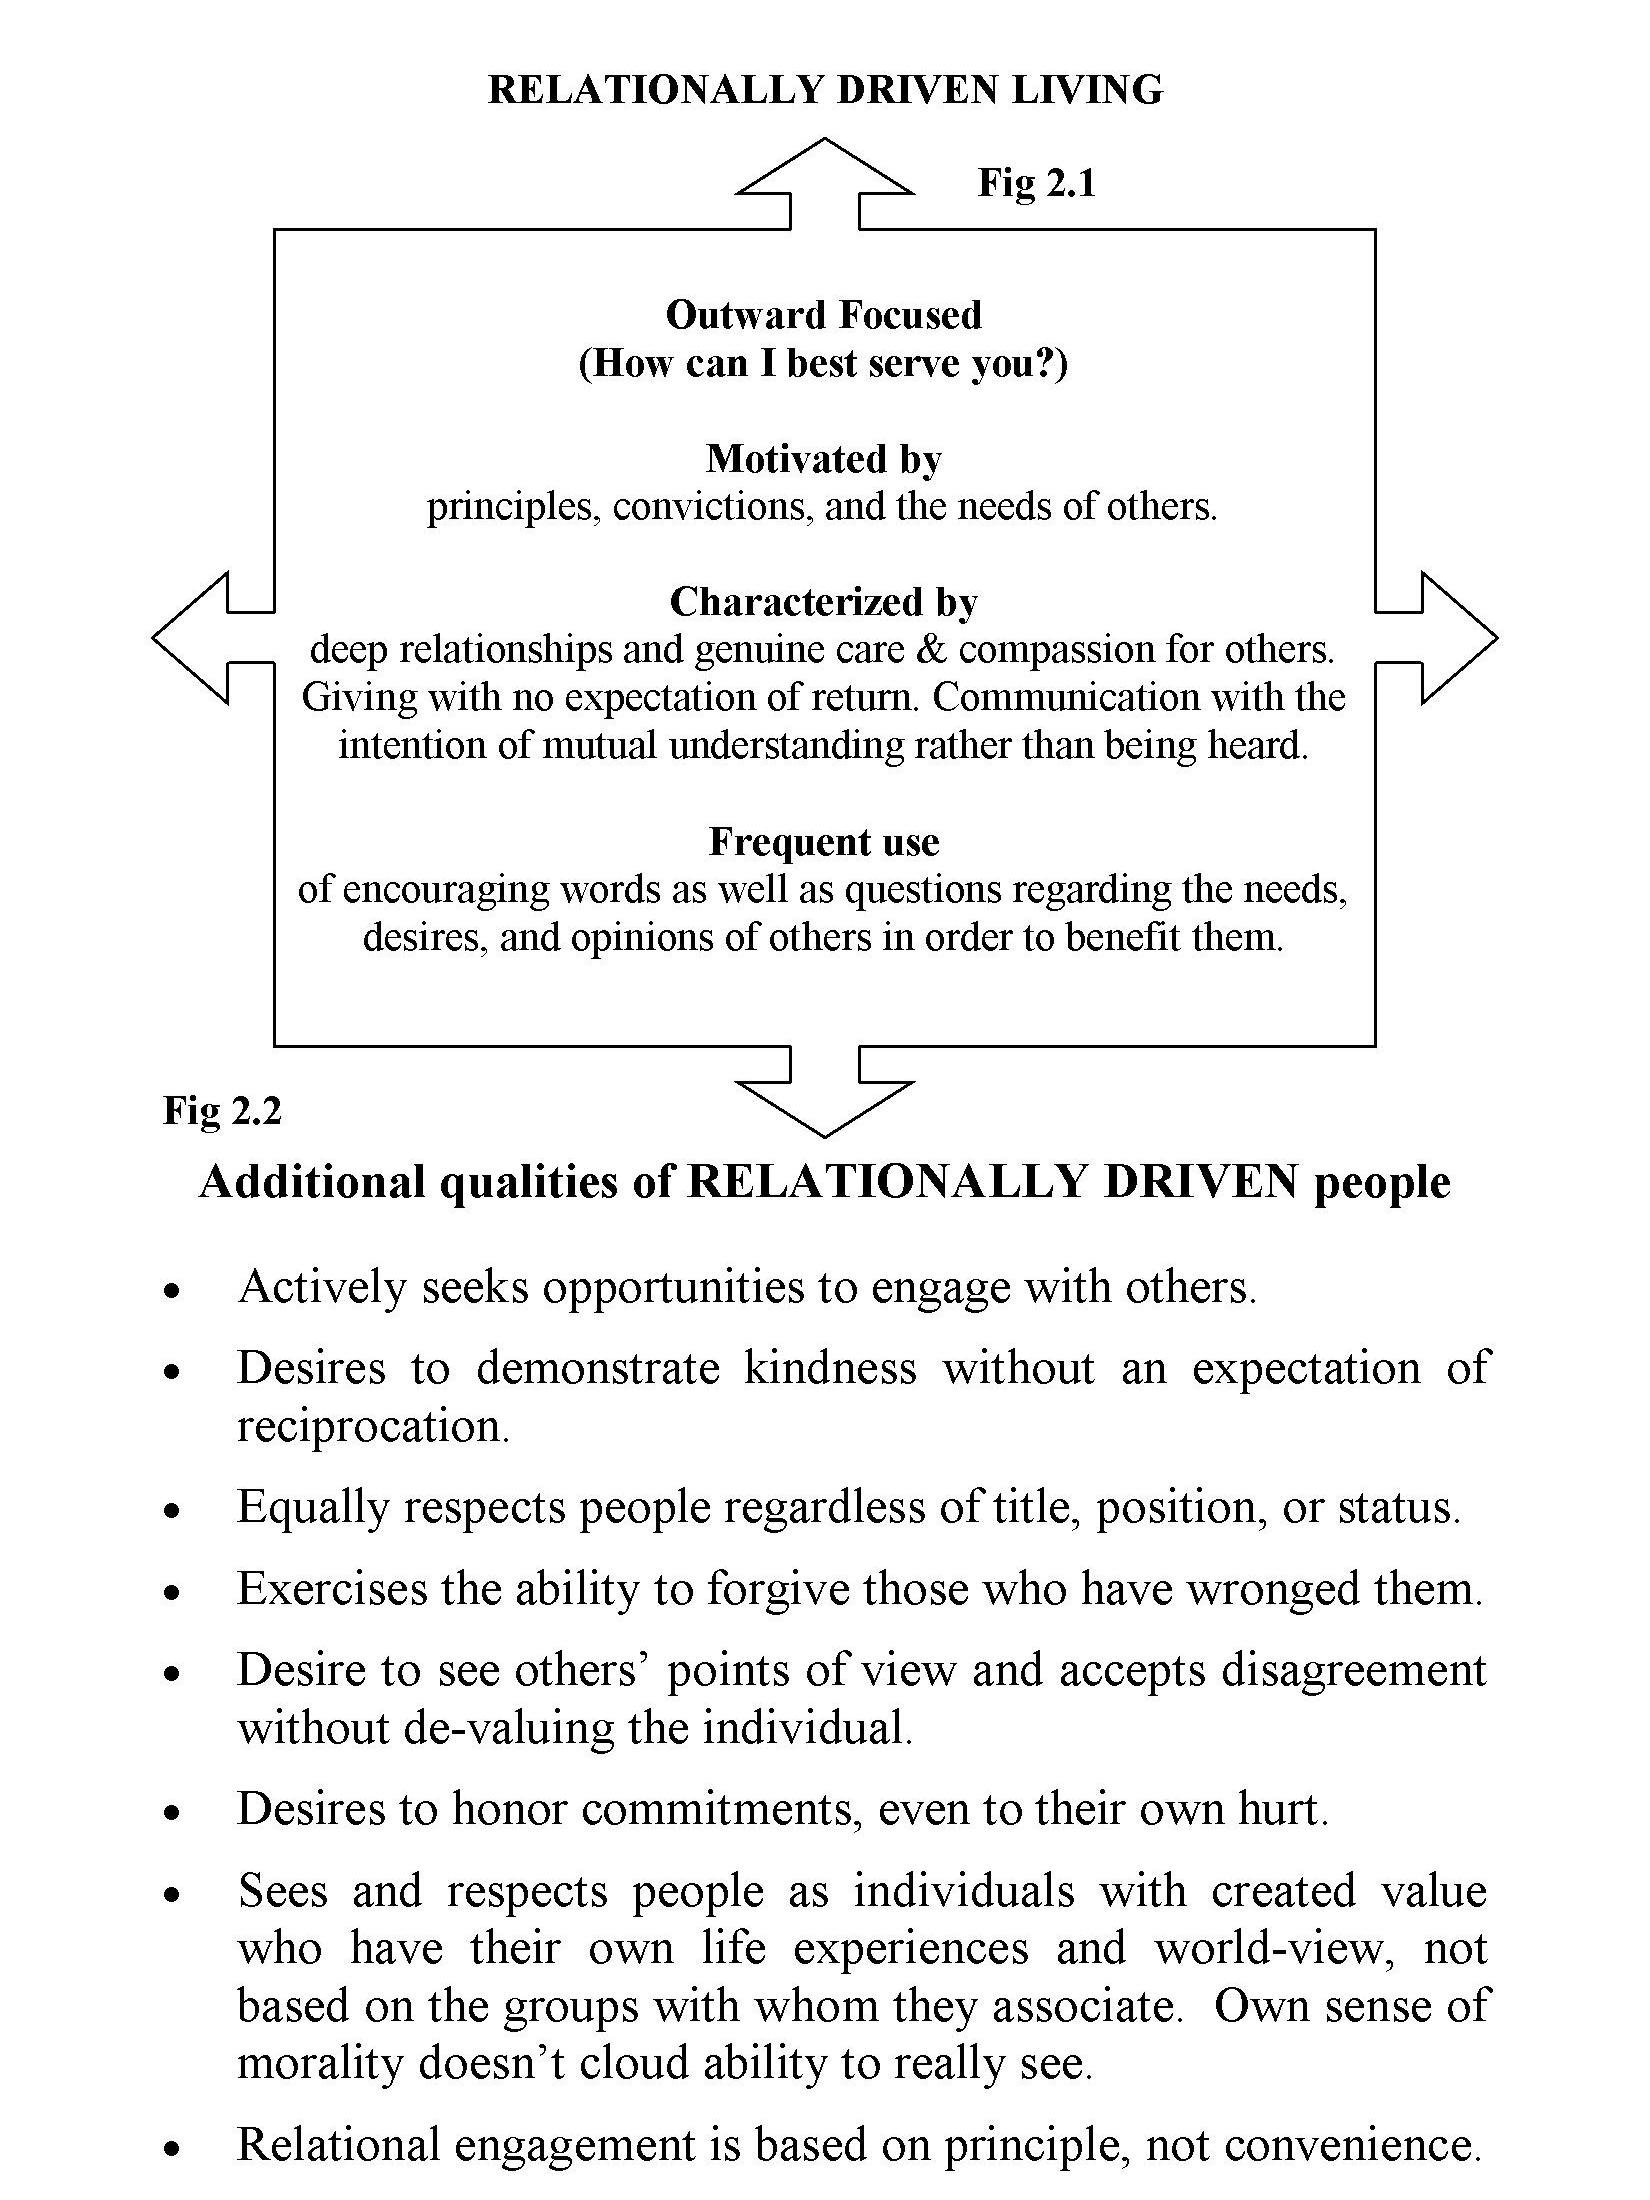 RDLiving Chart.jpg